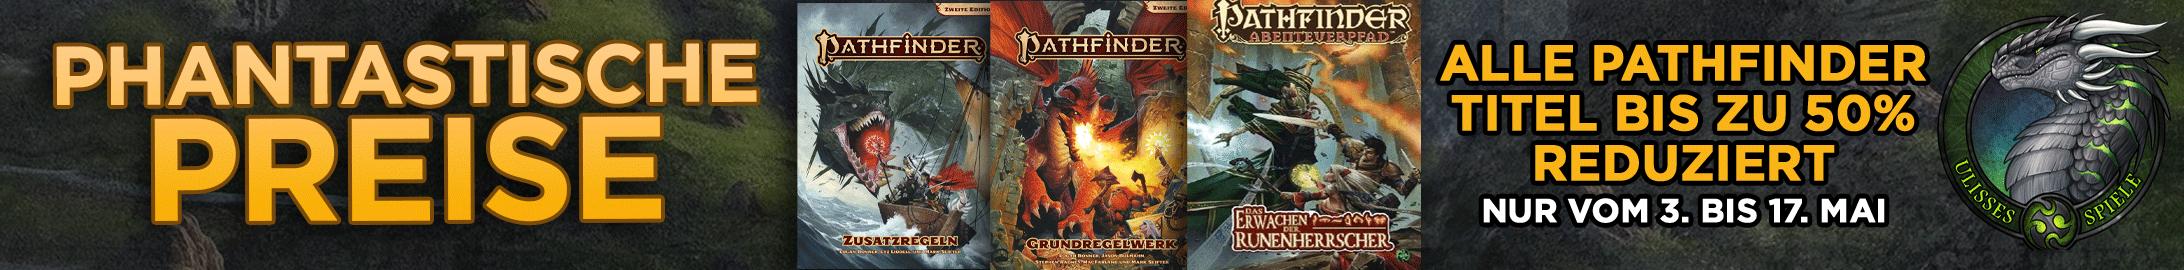 Pathfinder Promotion